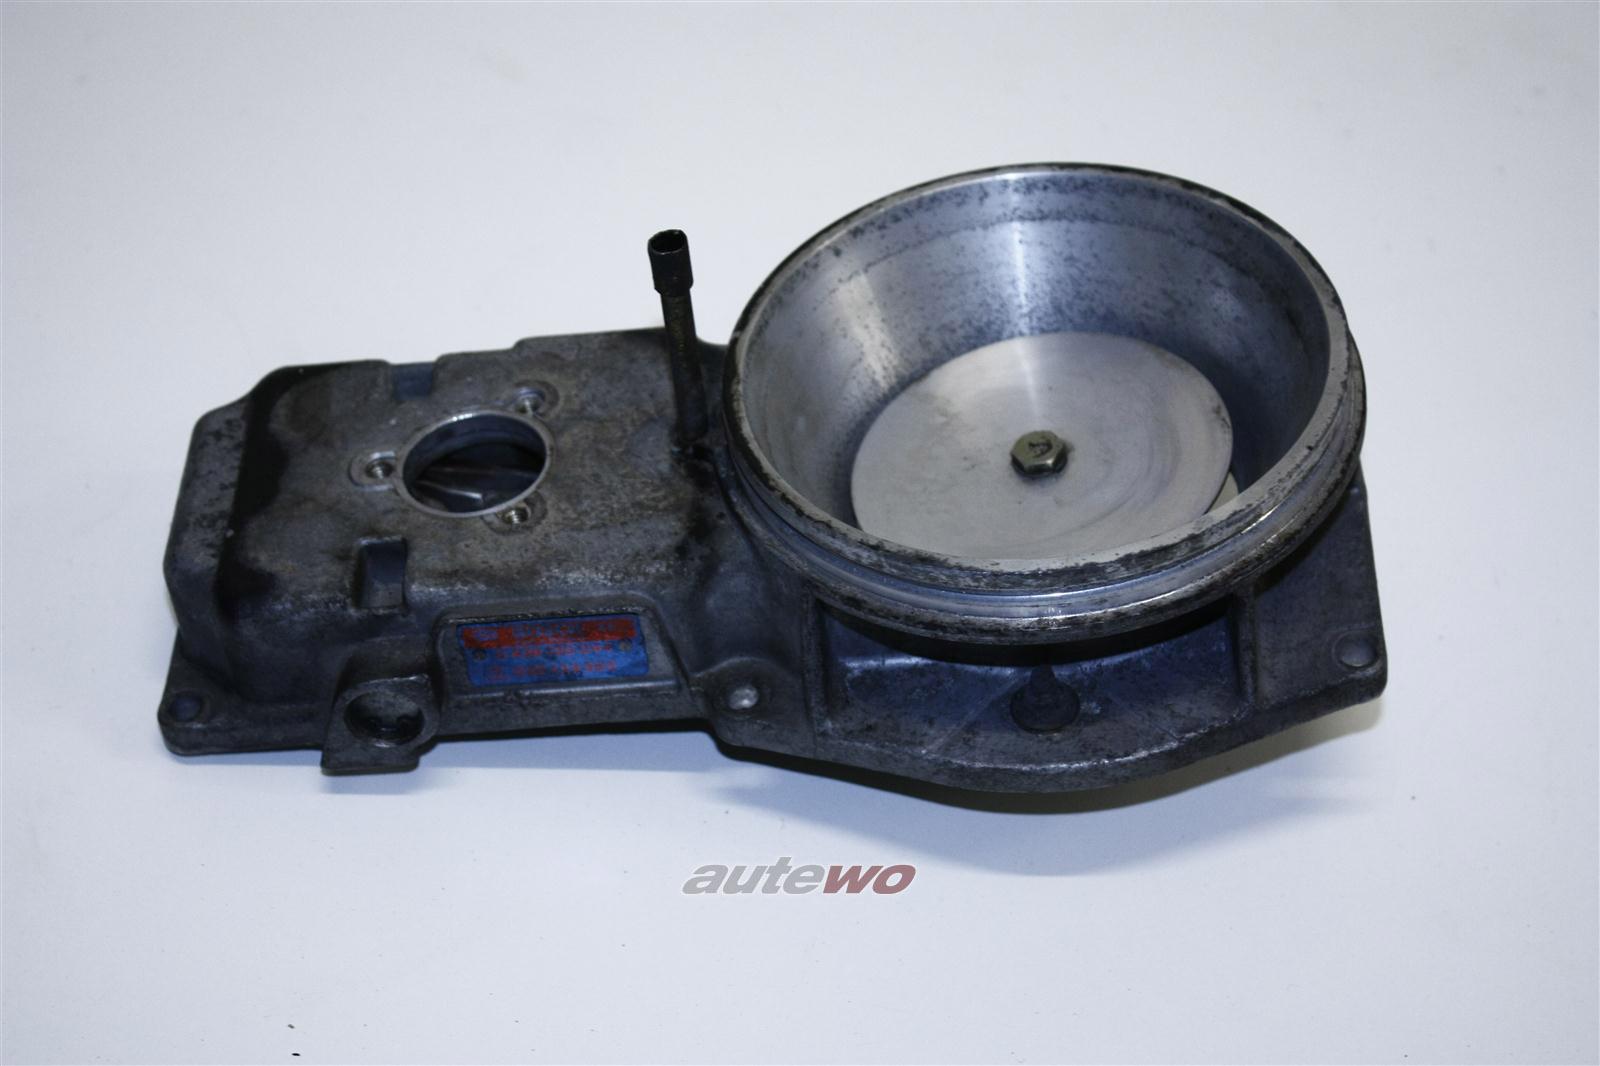 Audi 80/90 Typ 81/85/100 Typ 44 2.0-2.2l Luftmengenmesser 035133471 035133353